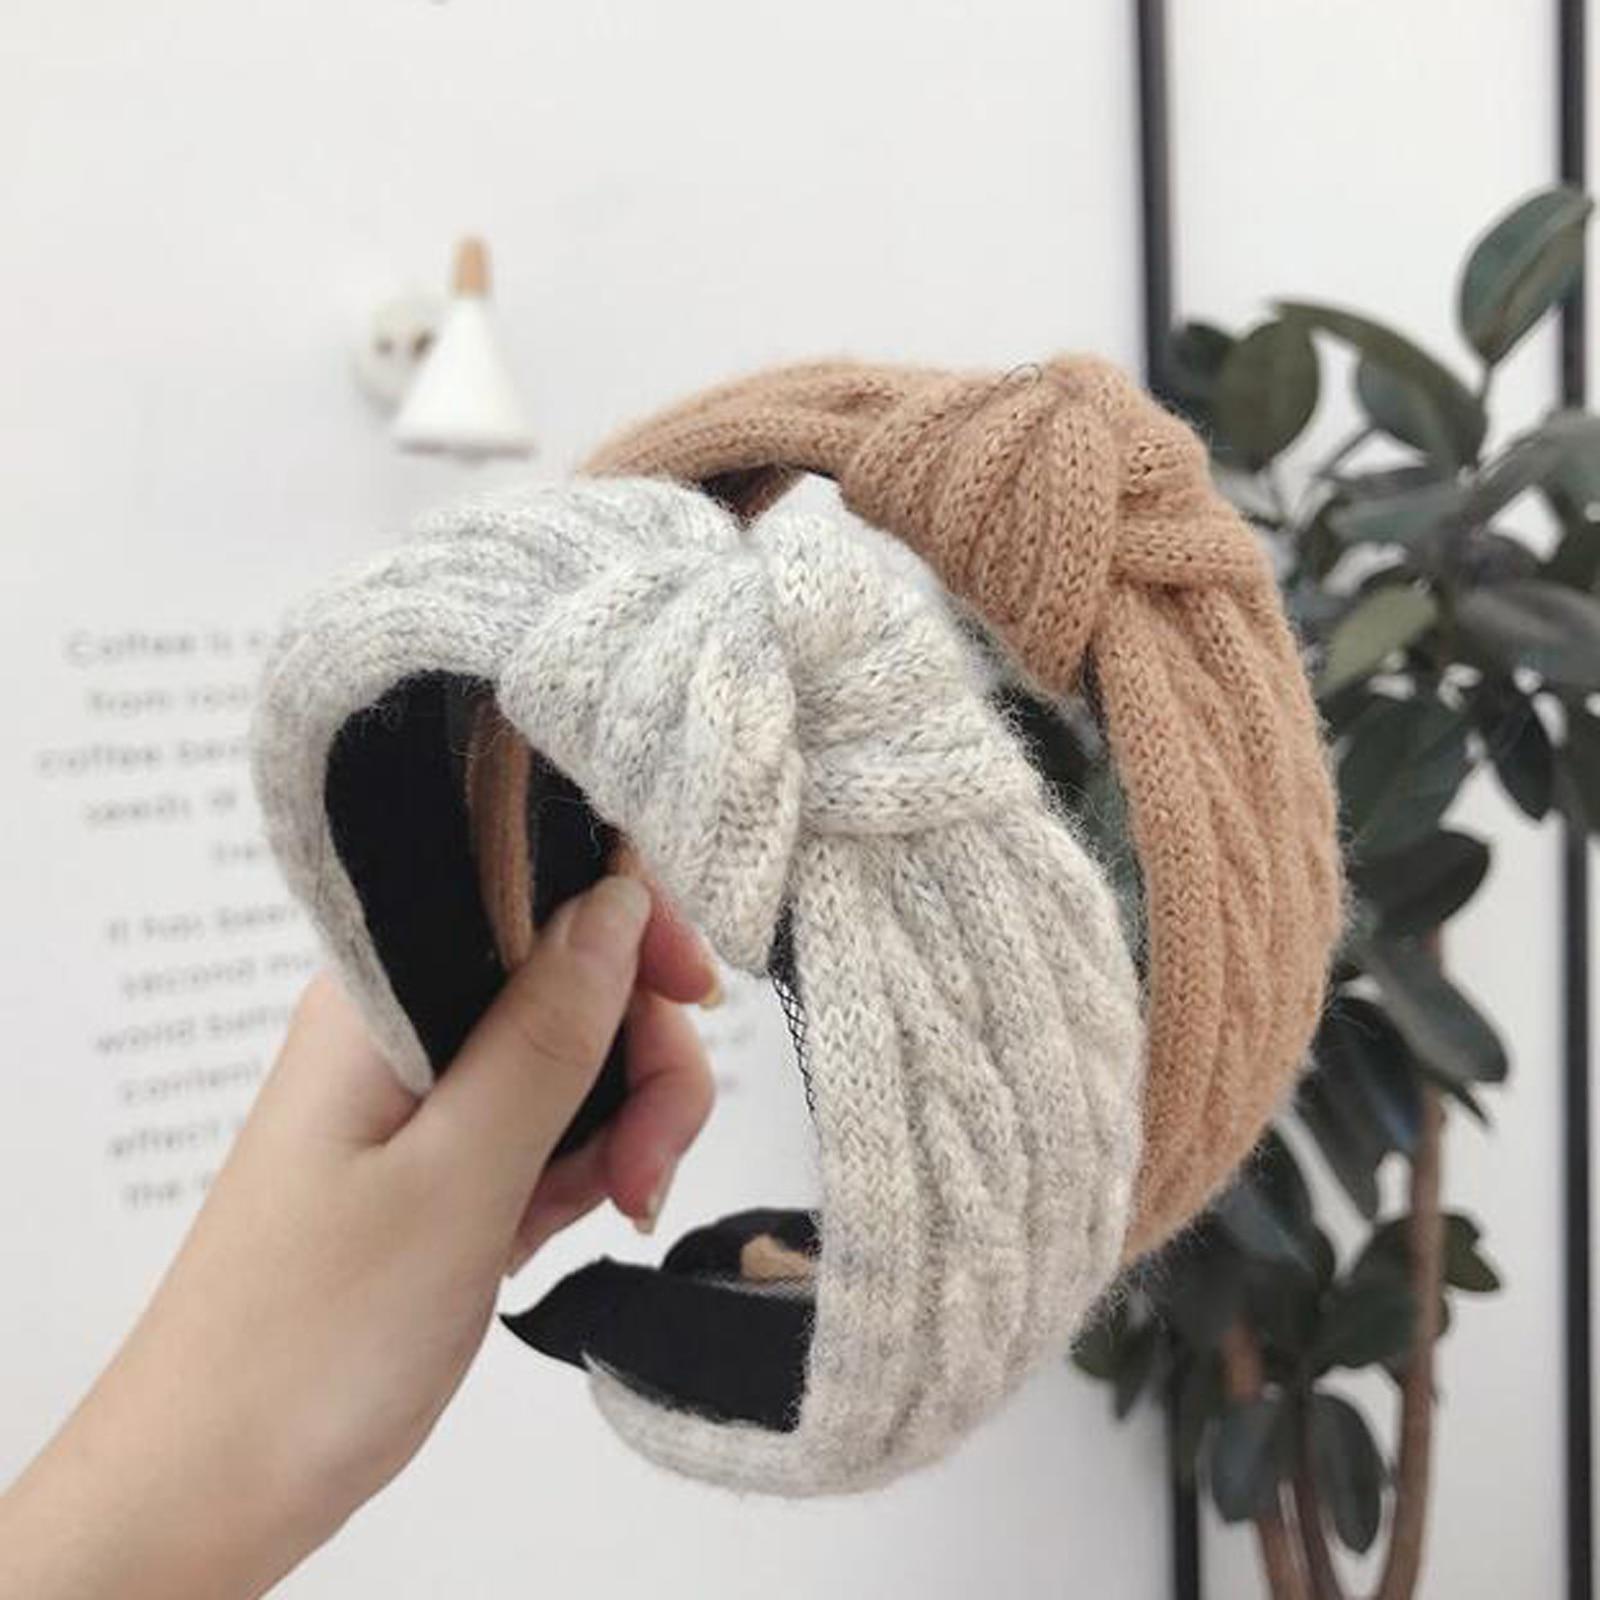 New Winter Kintted Headband Women Warm Handmade Hairband Girls Fashion Solid Turban Center Knot Casual Hair Accessories